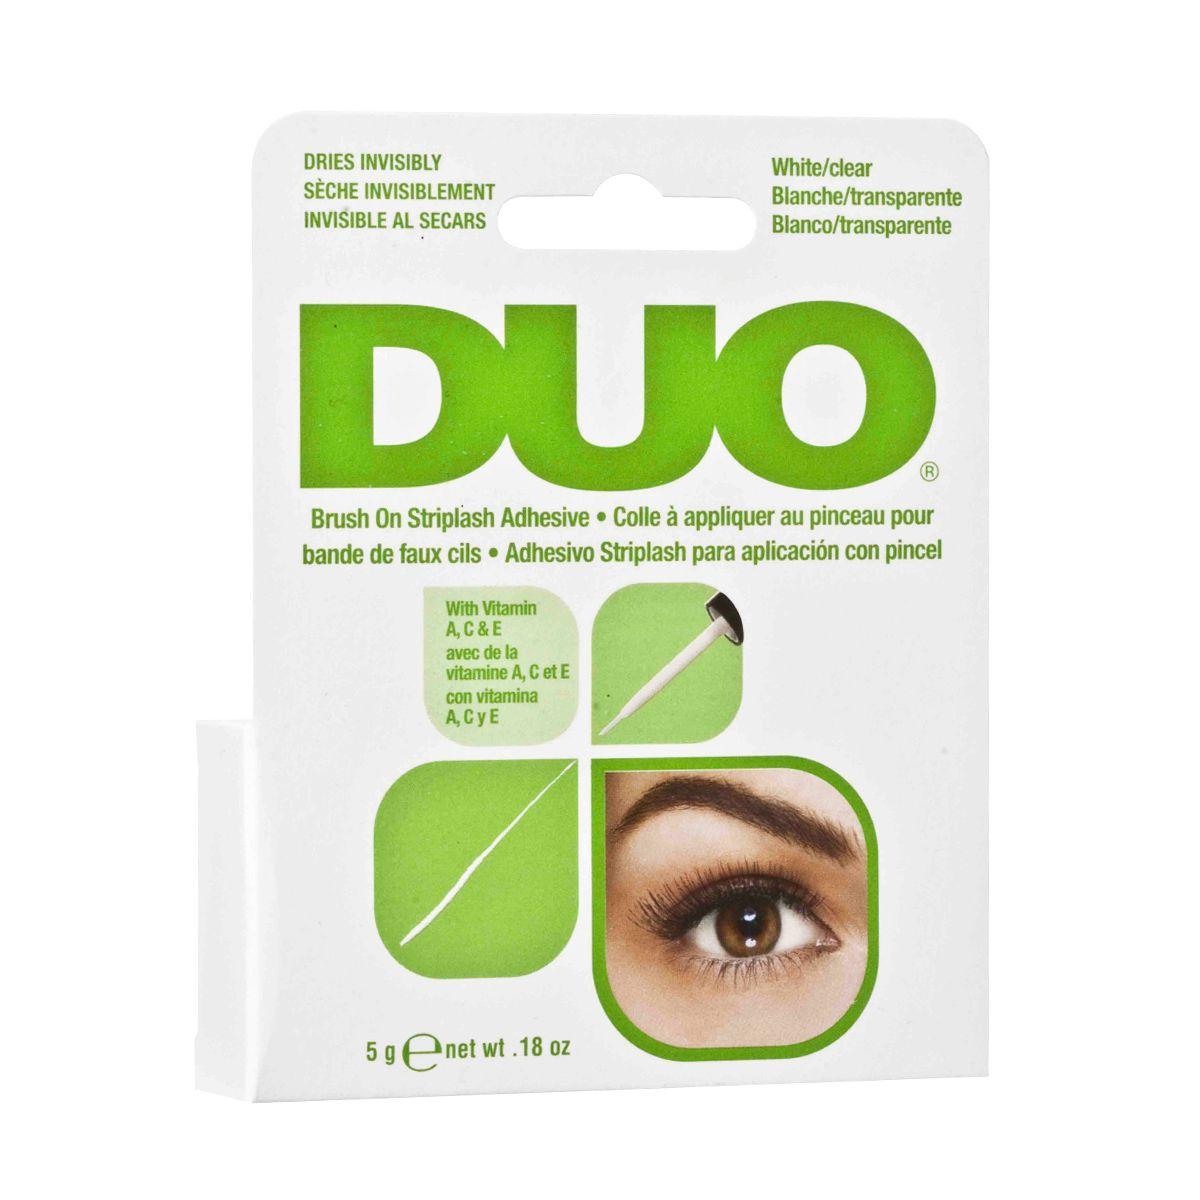 Duo - Cola para cílios Brush On Striplash Adhesive